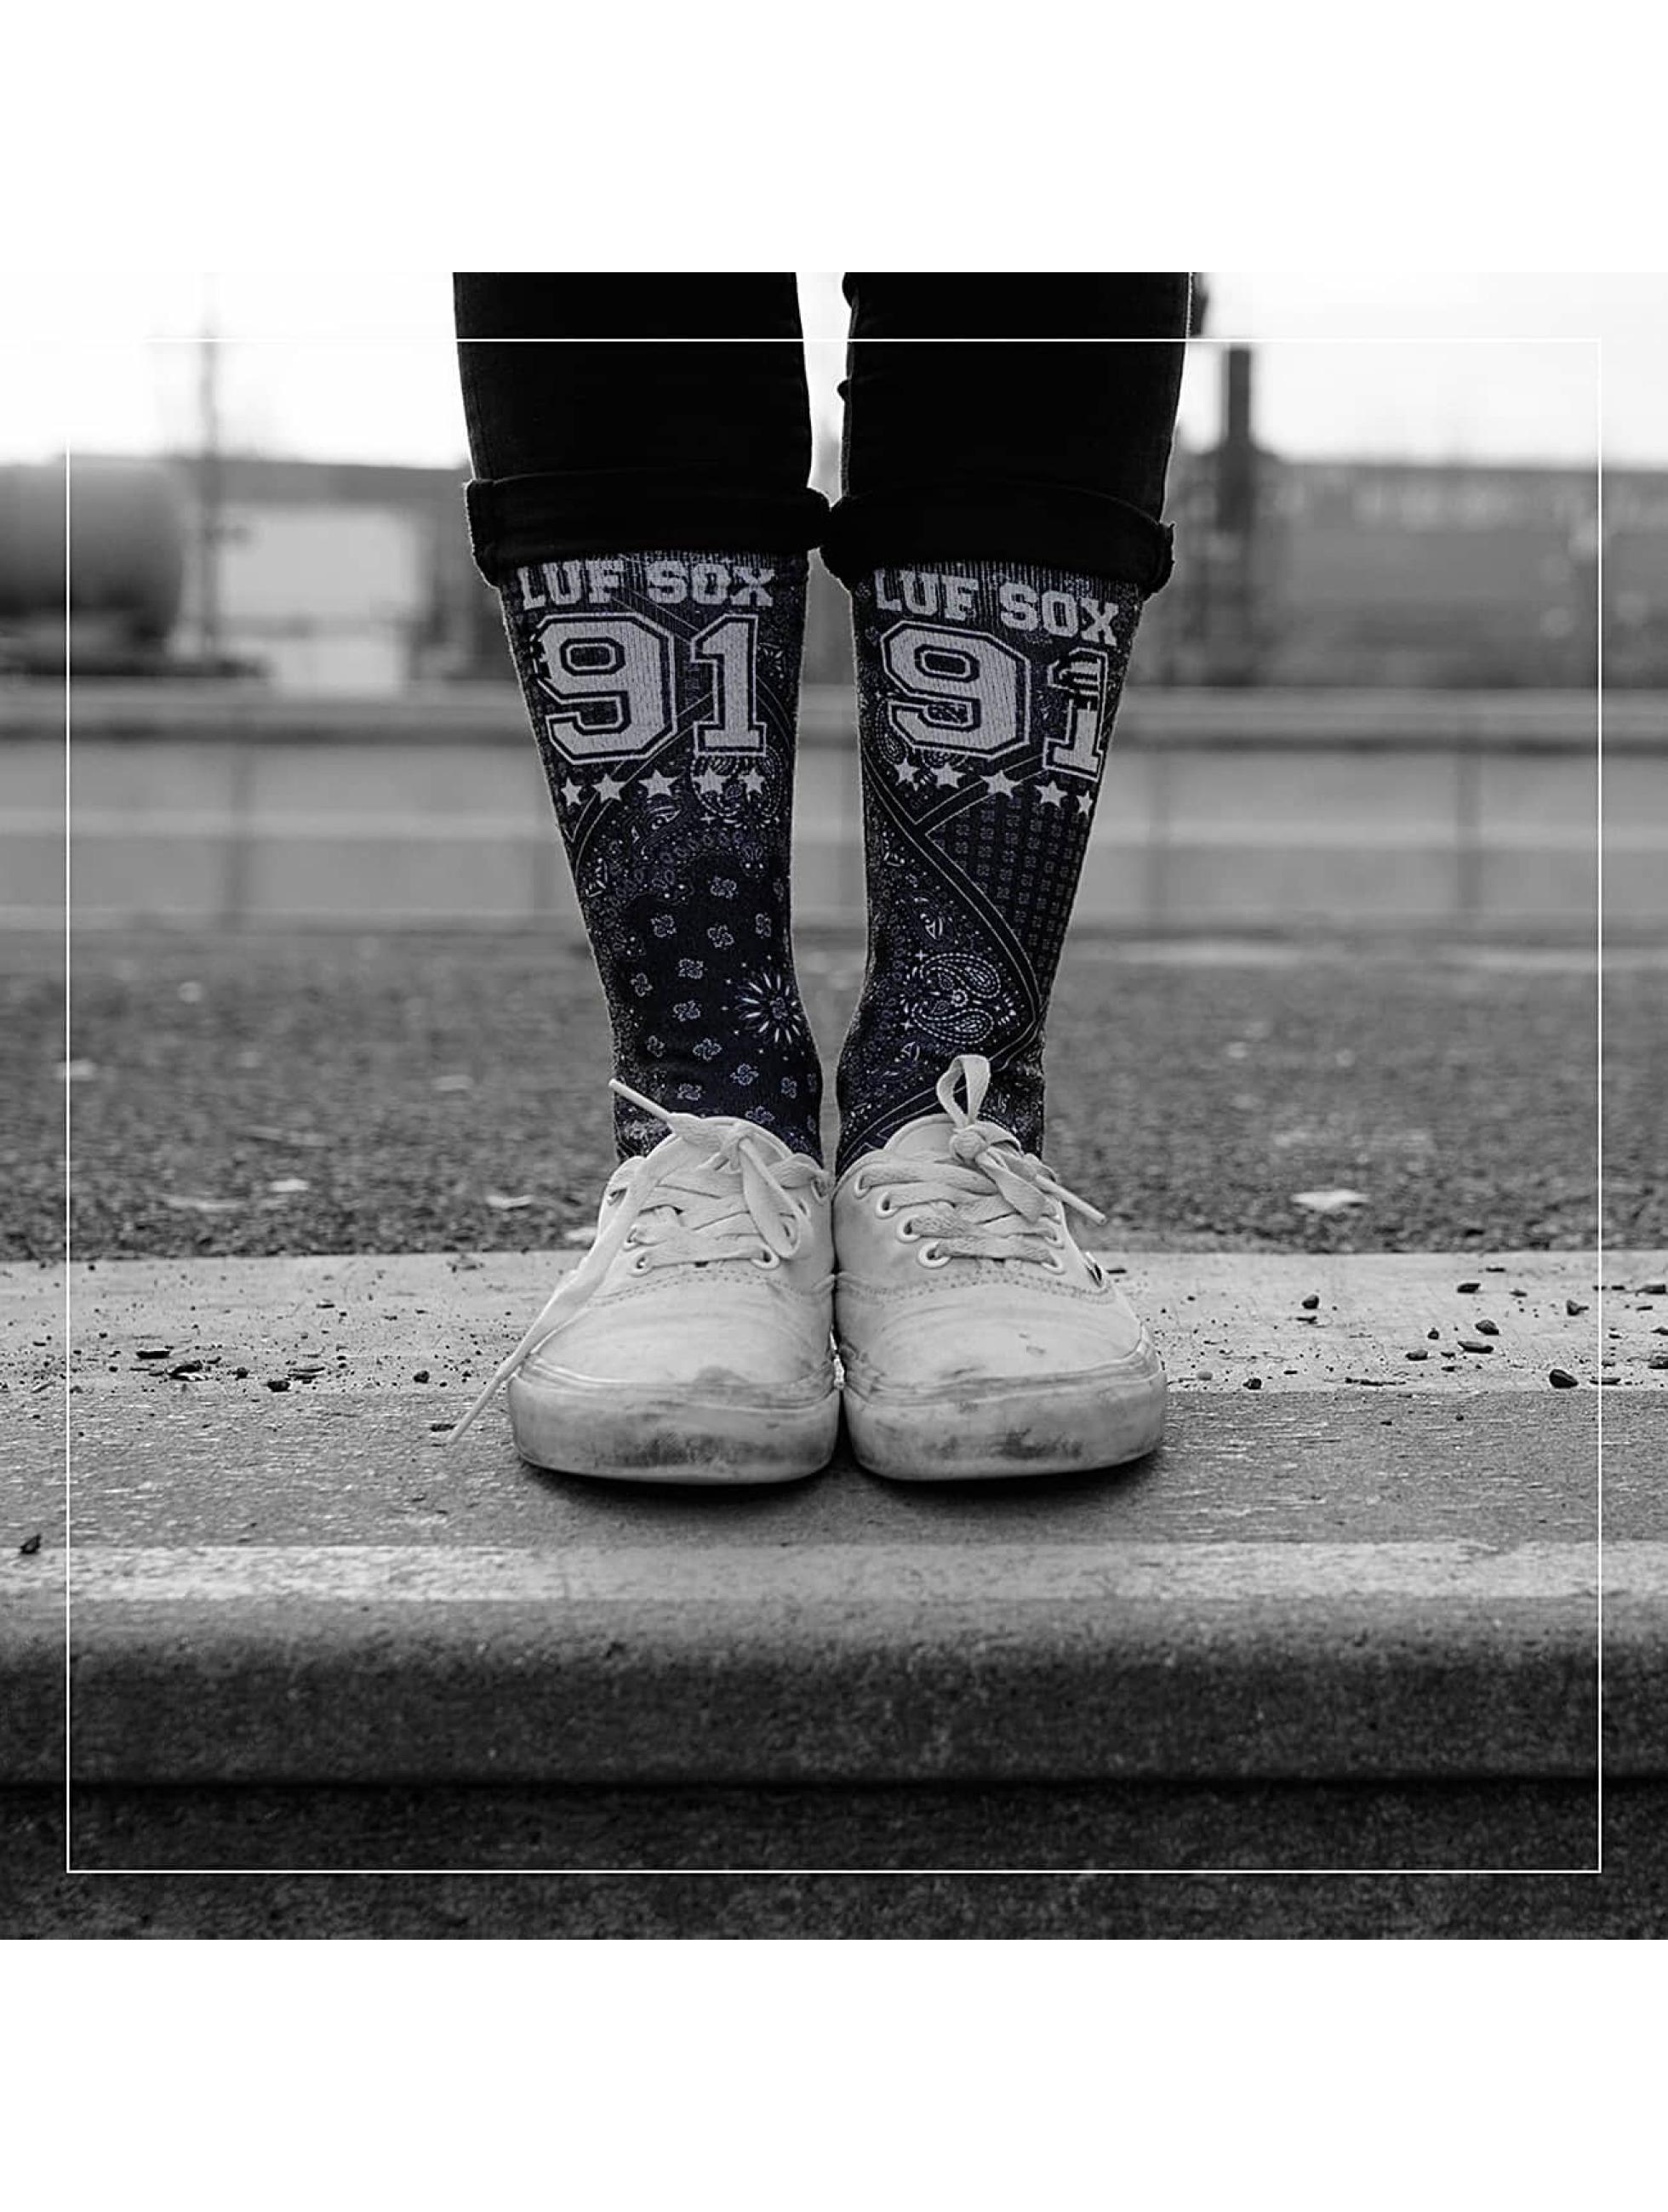 LUF SOX Männer,Frauen Socken Bandana in schwarz